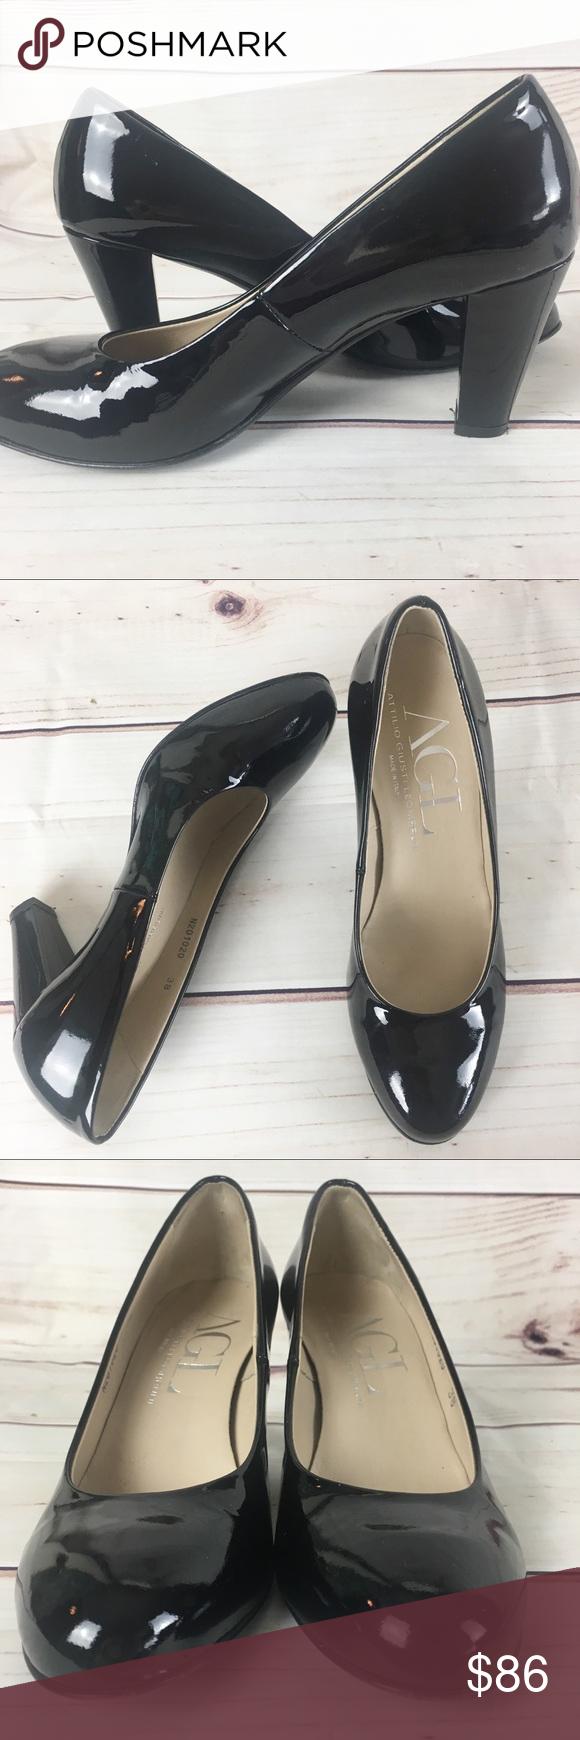 AGL Attilio Giusti Leombruni Cap Toe Ballet Heel | Shoes